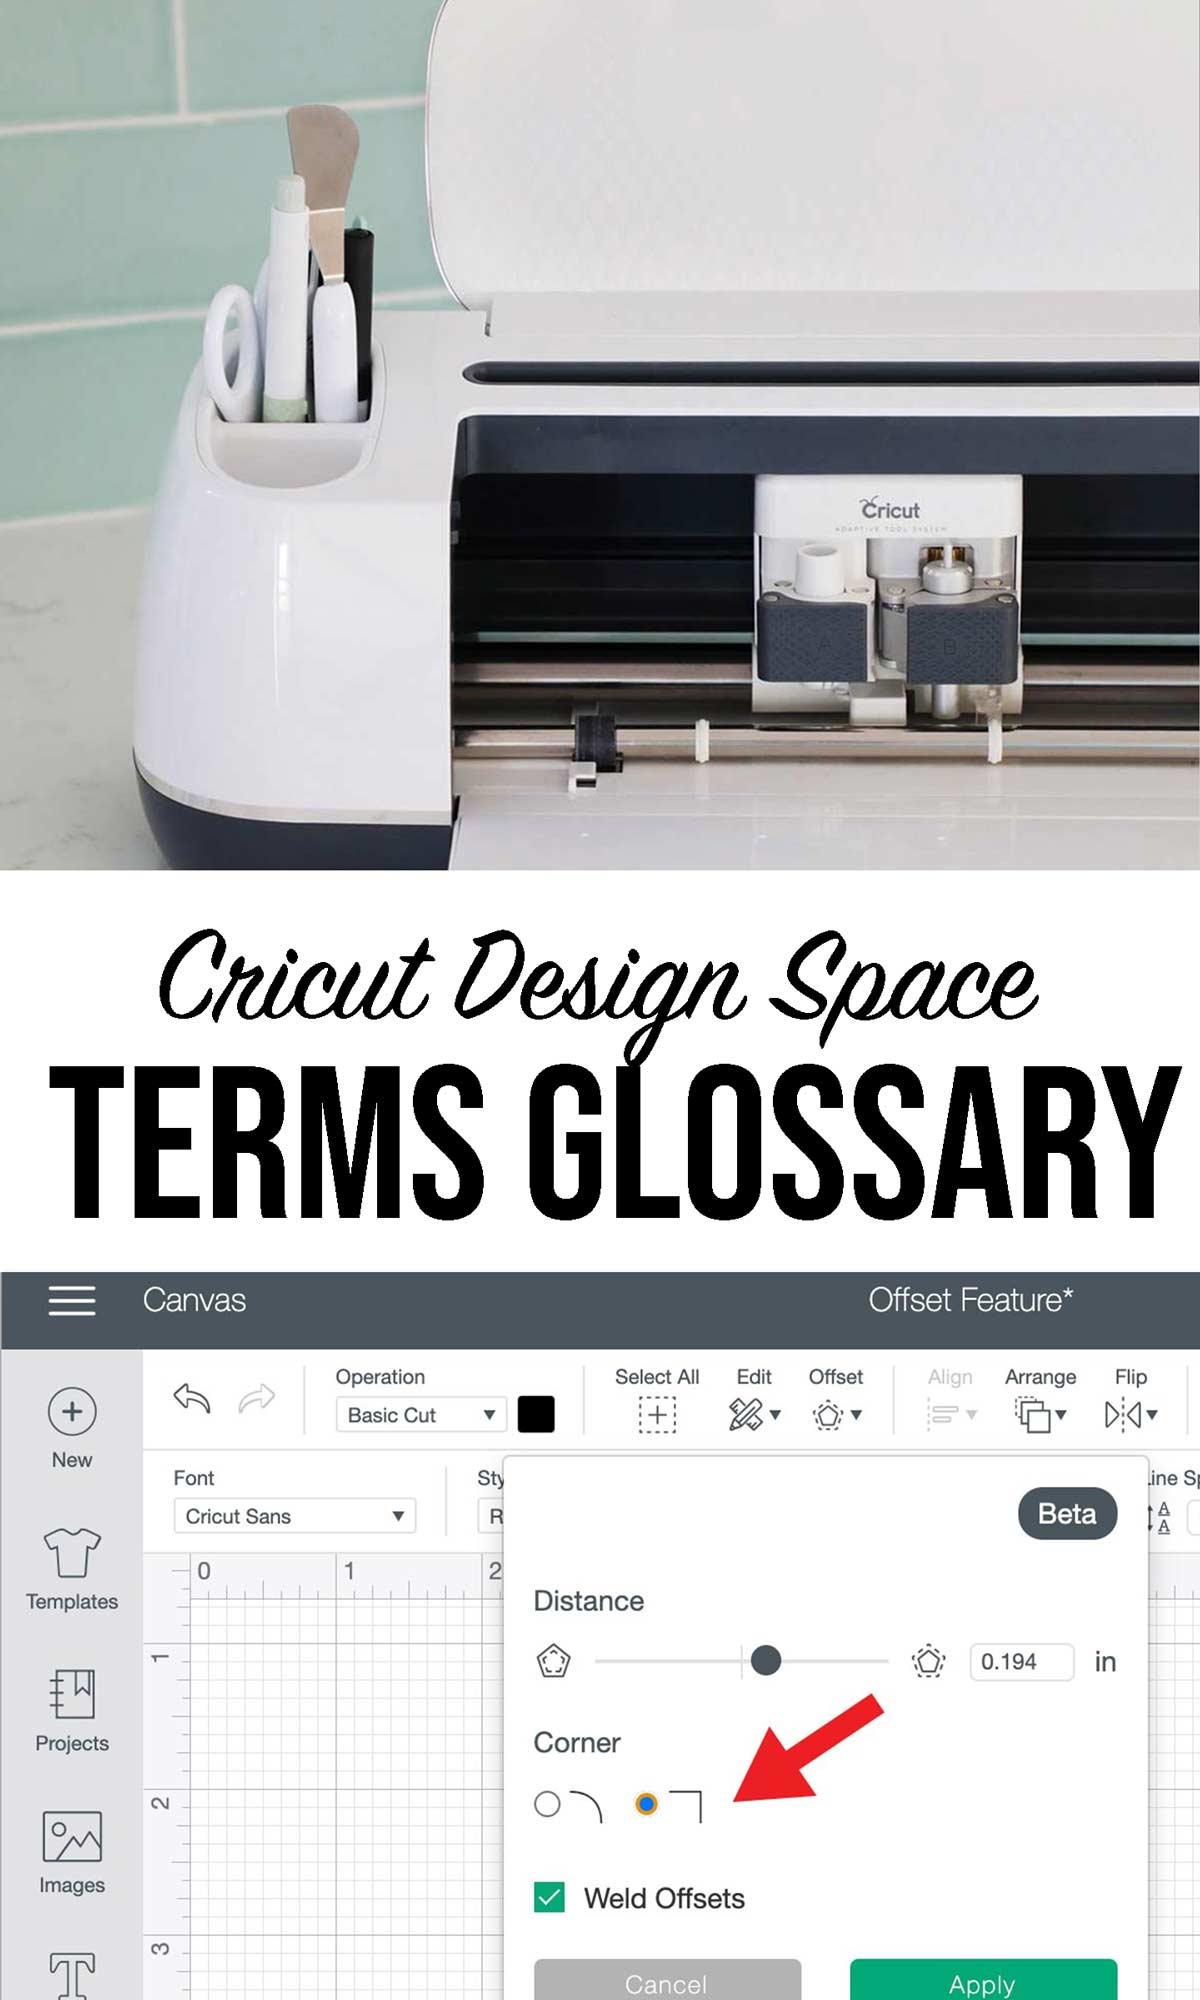 Cricut Design Space Terms